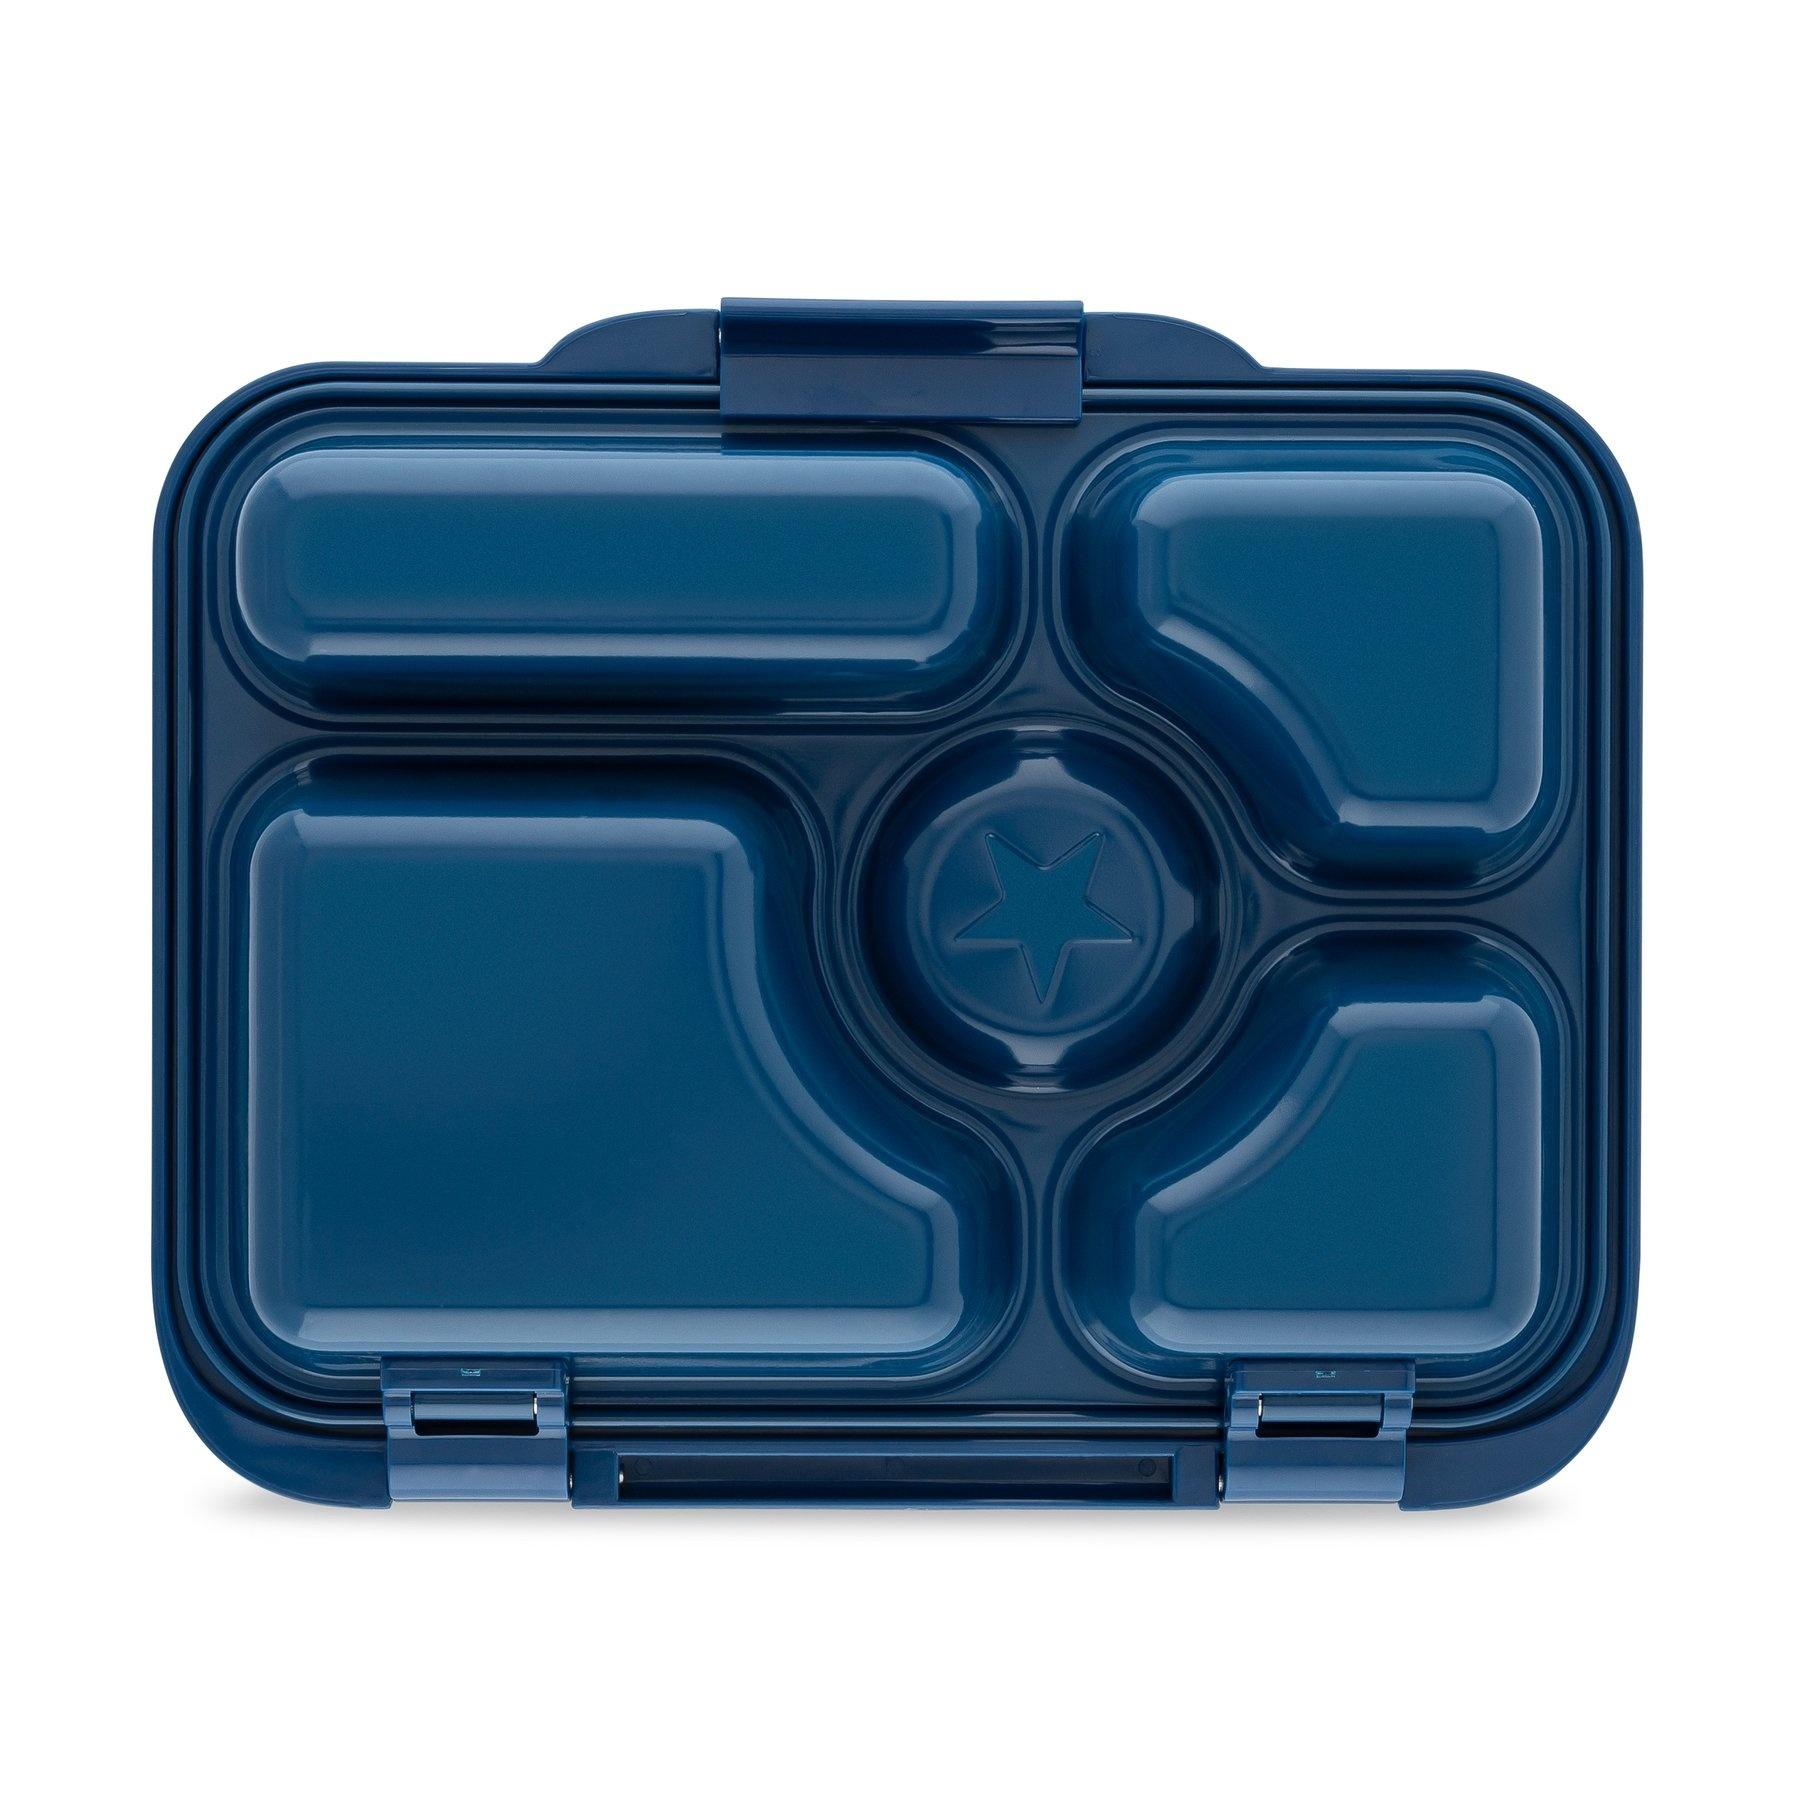 Stainless steel Bento Box with ceramic tray - Santa Fe blue-4